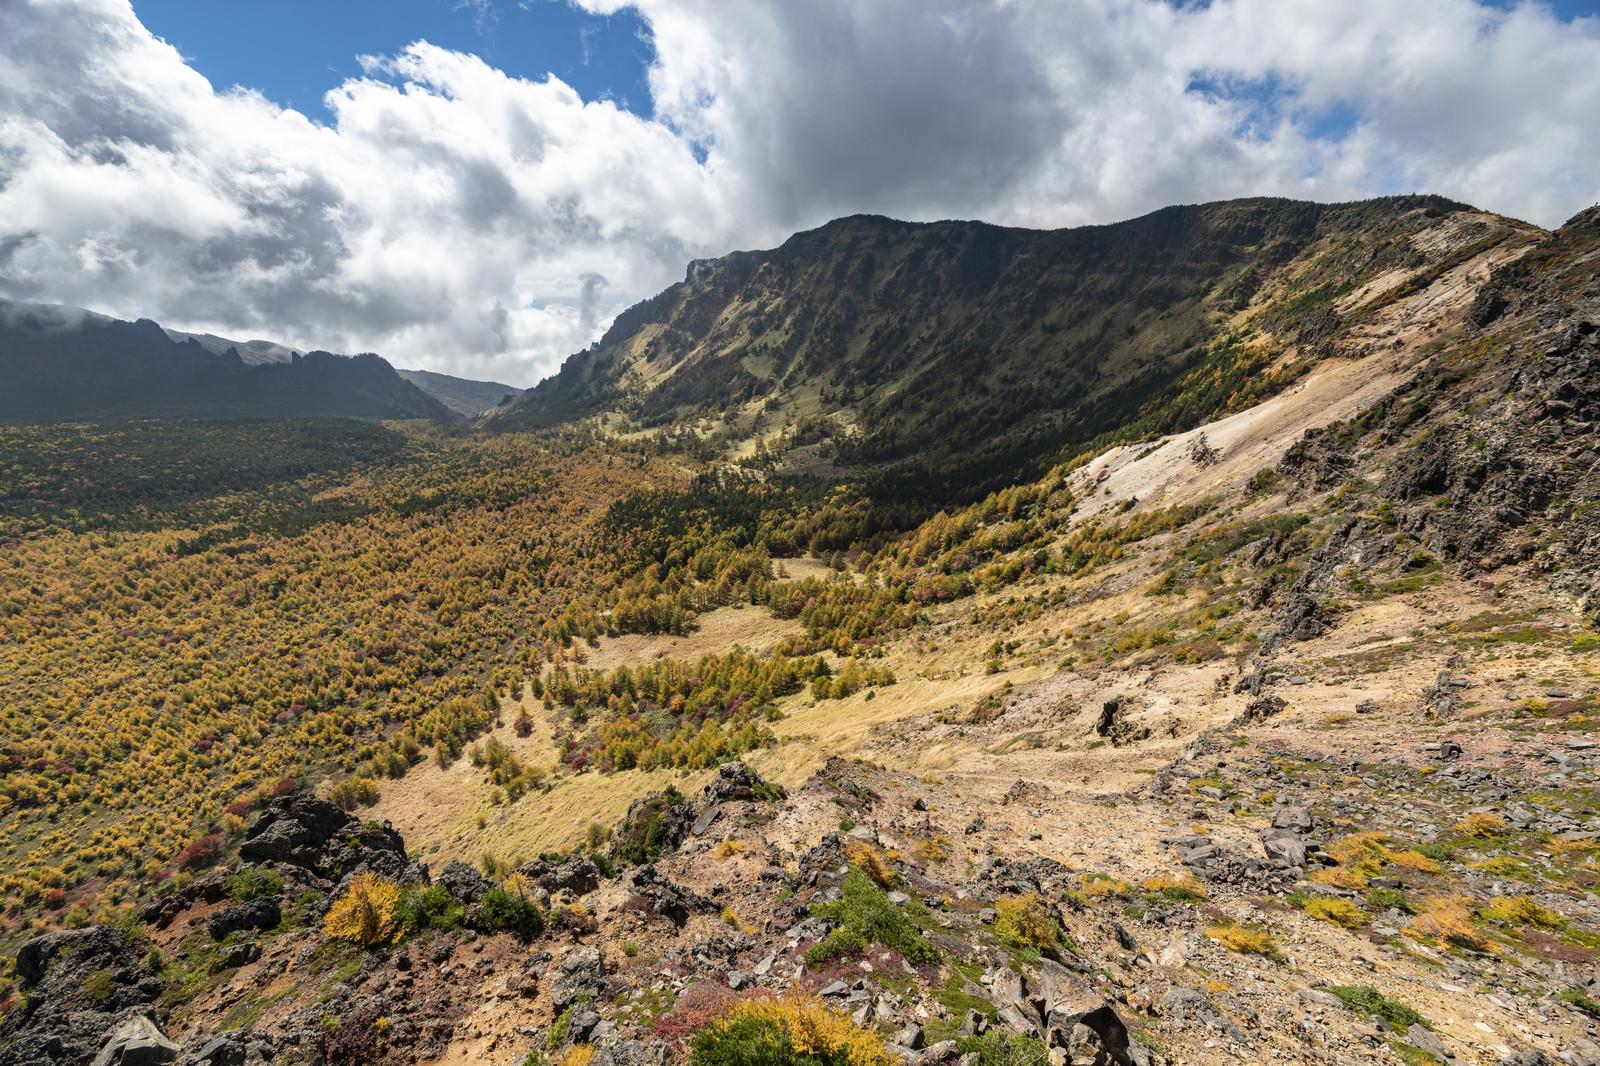 「紅葉の黒斑山稜線(浅間山)」の写真